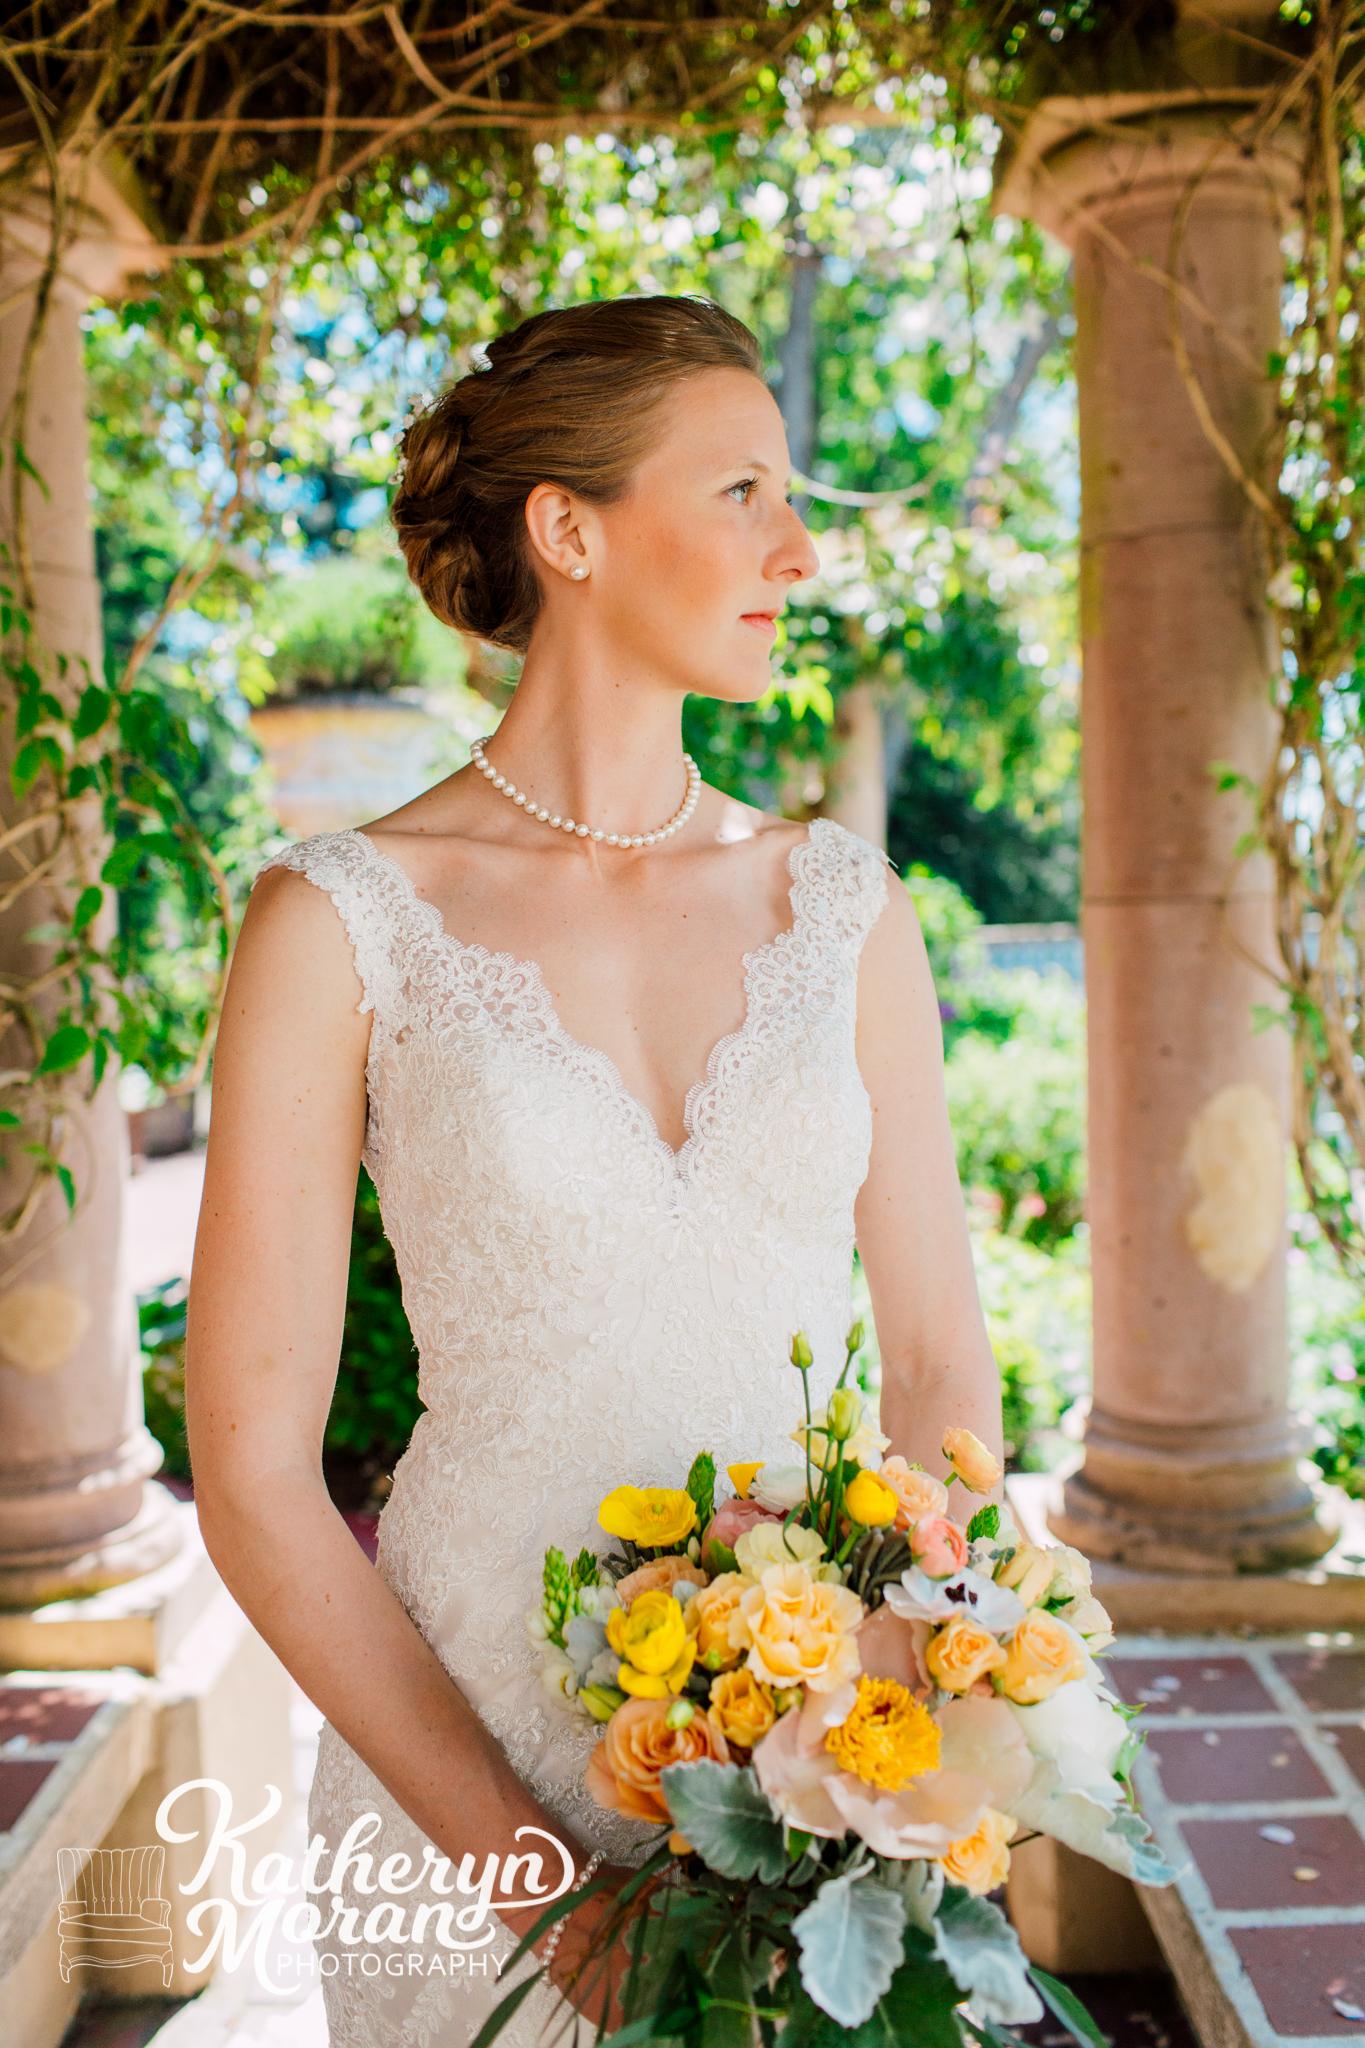 bellingham-wedding-photographer-lairmont-manor-katheryn-moran-3.jpg